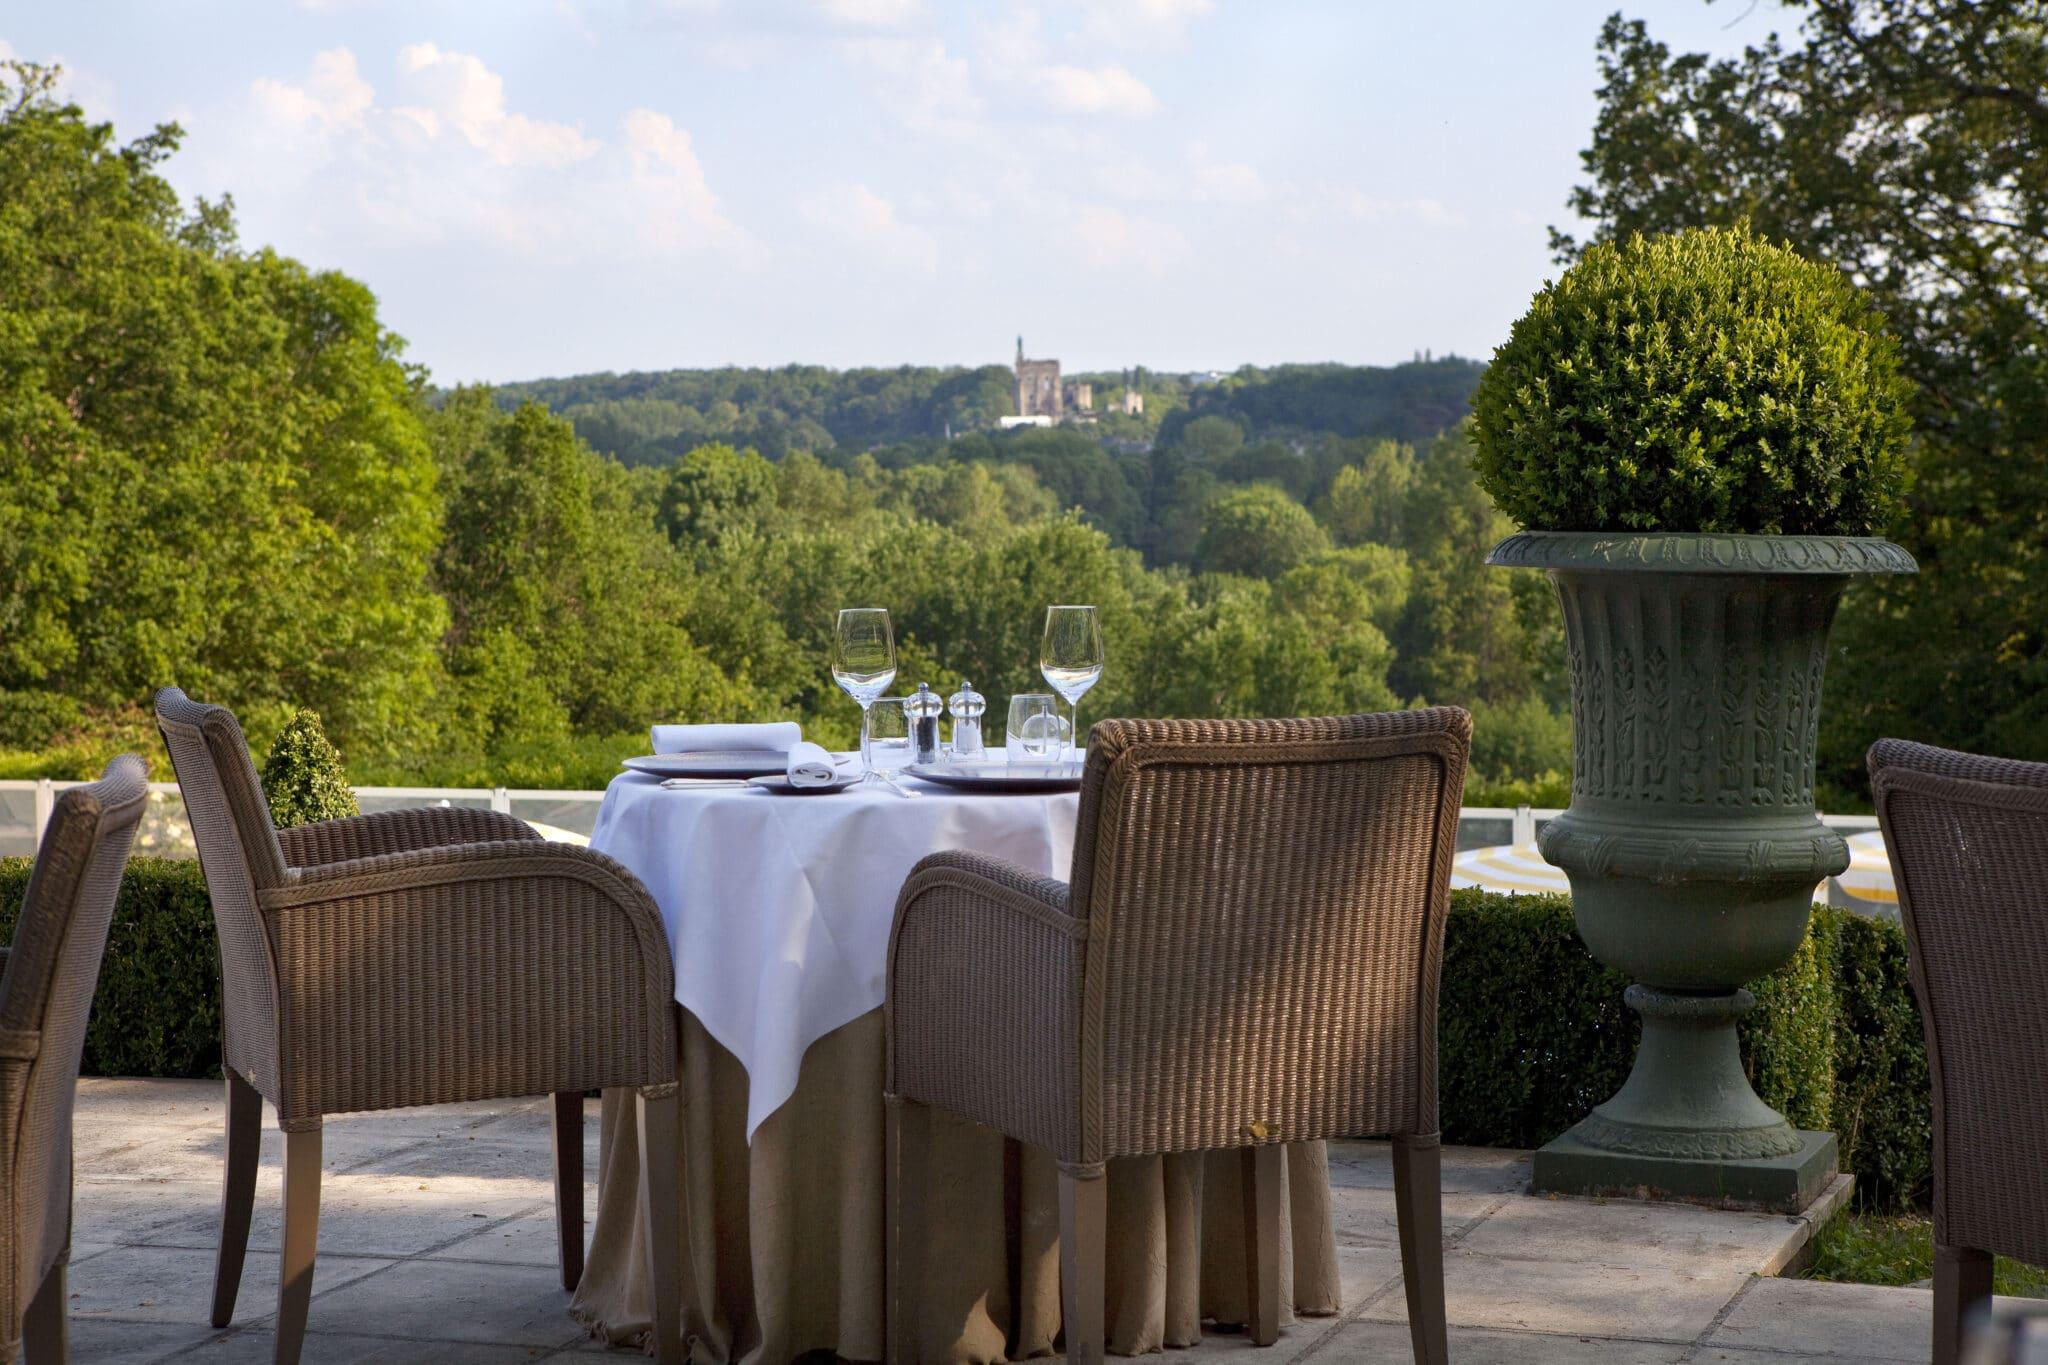 Restaurant gastronomique avec terrasse